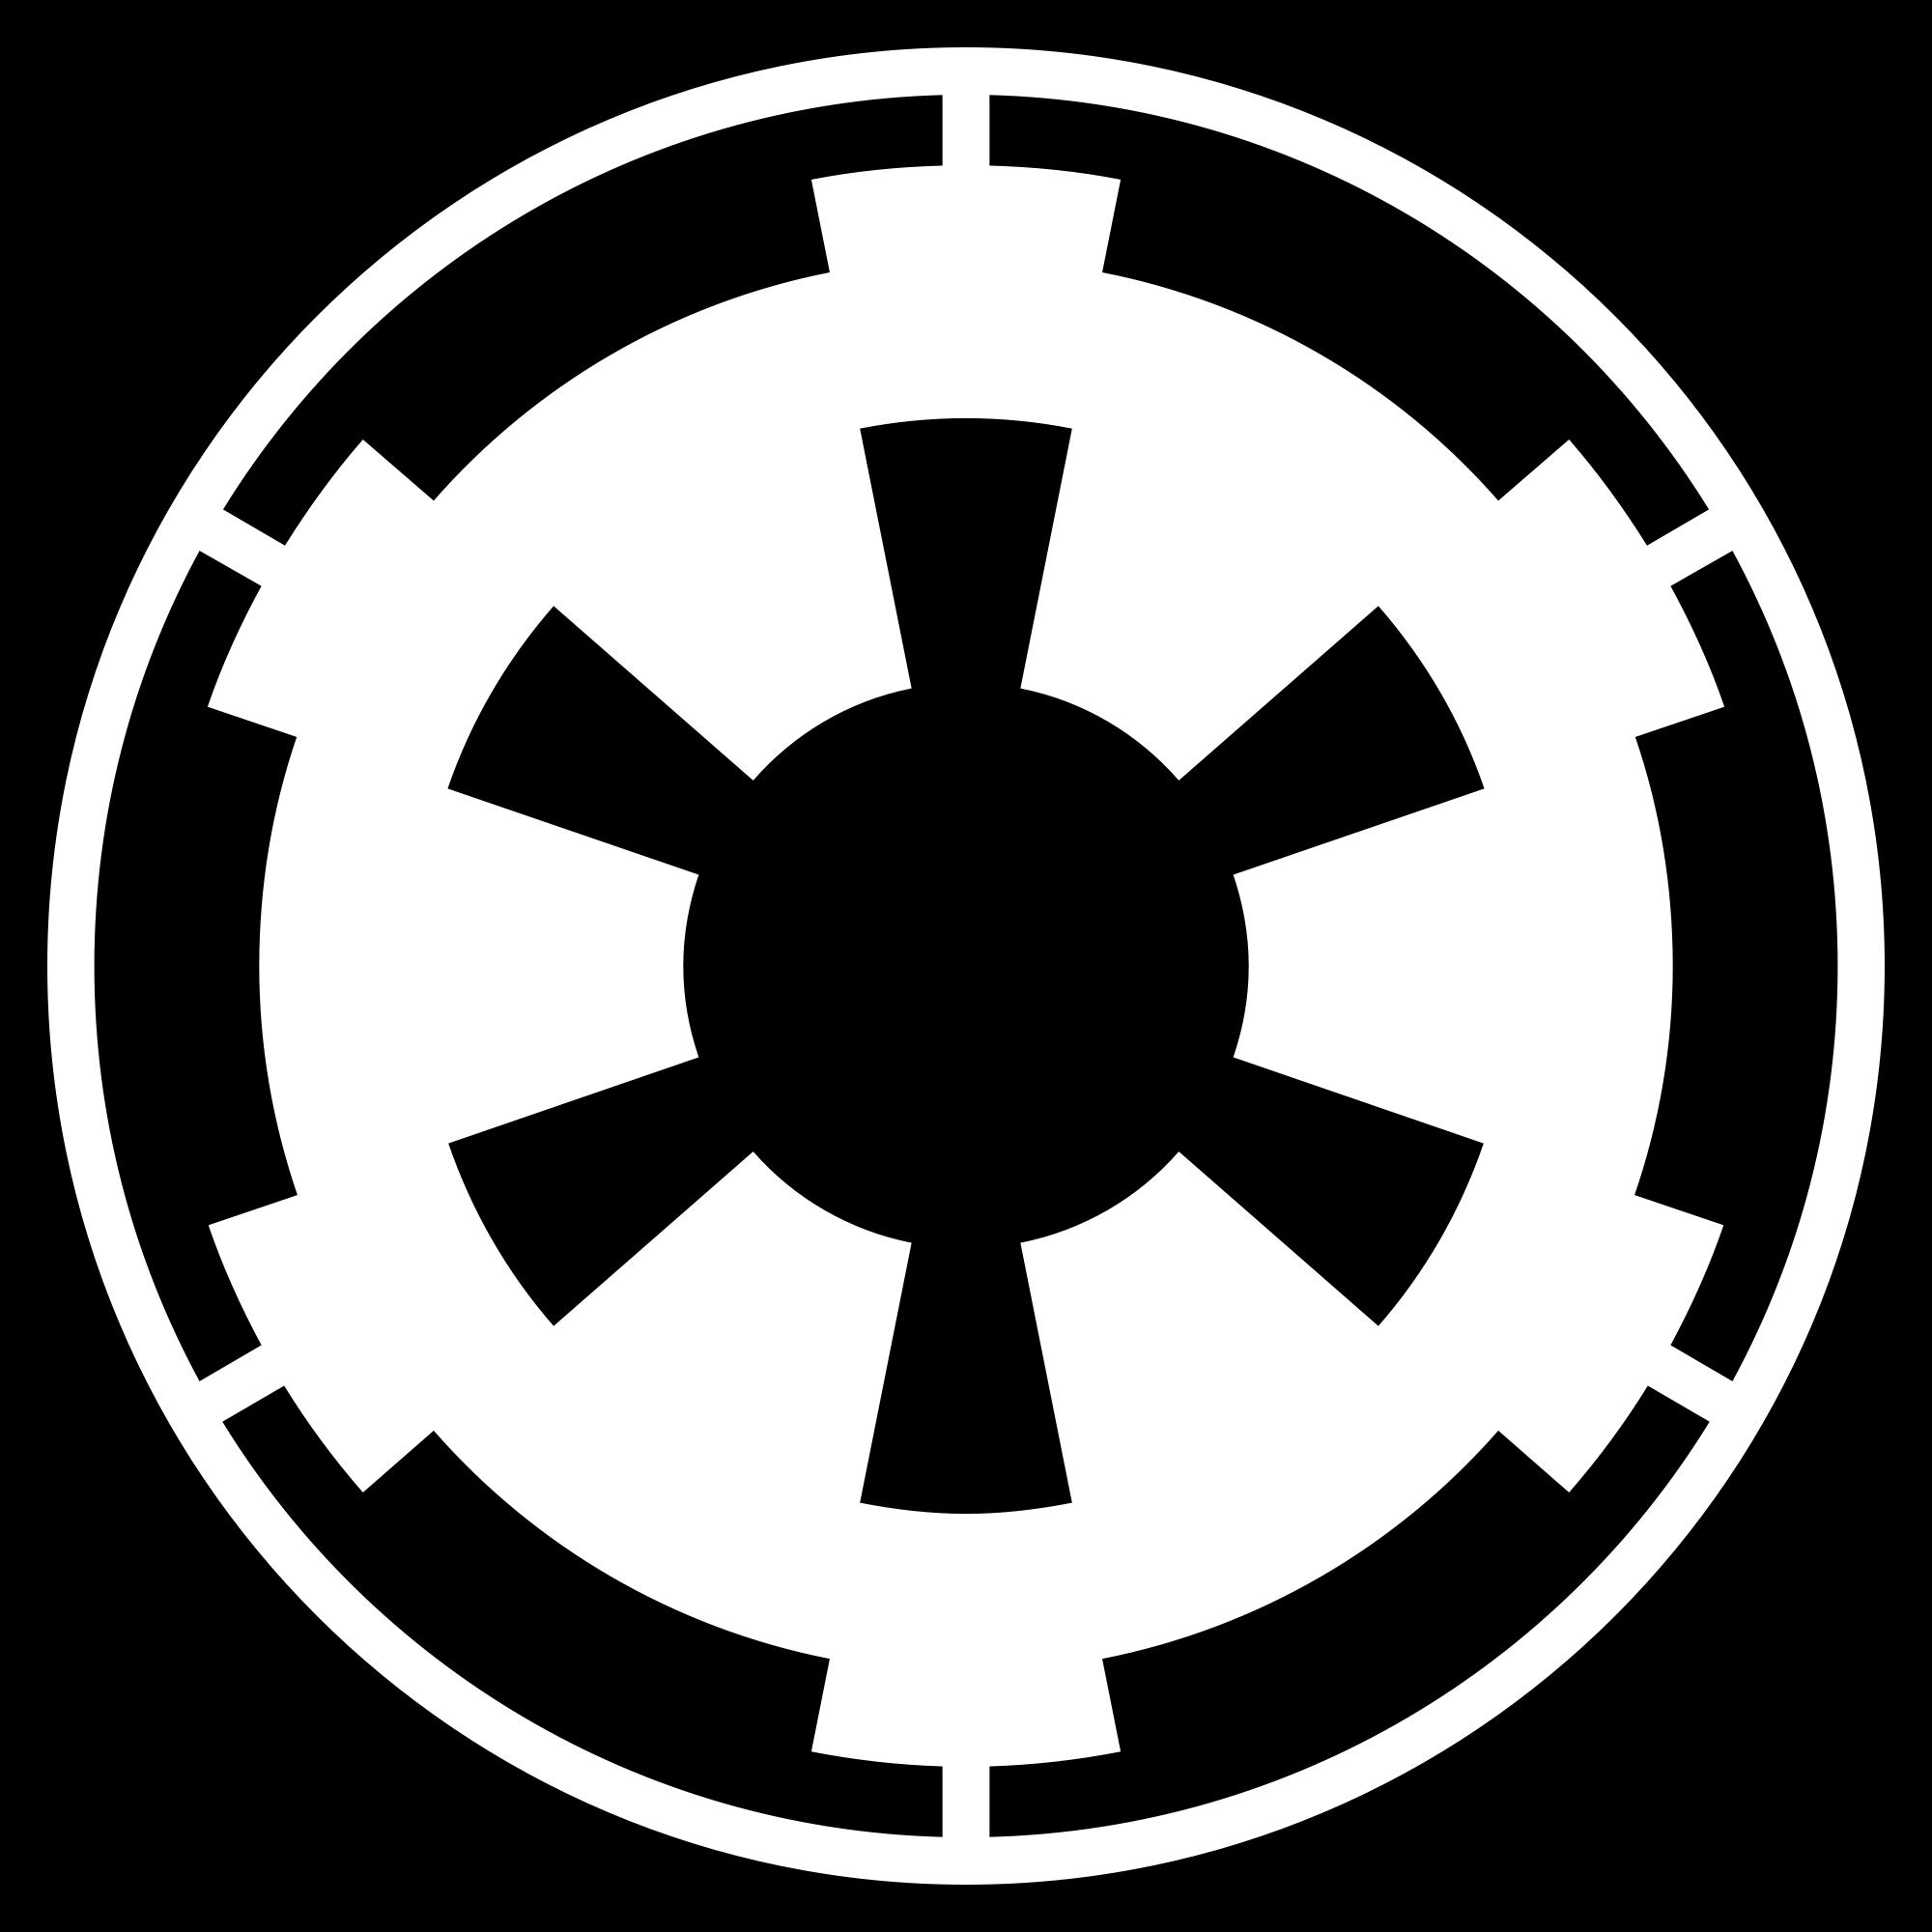 Image Galactic Empire Emblemg Star Wars Rebels Wiki Fandom